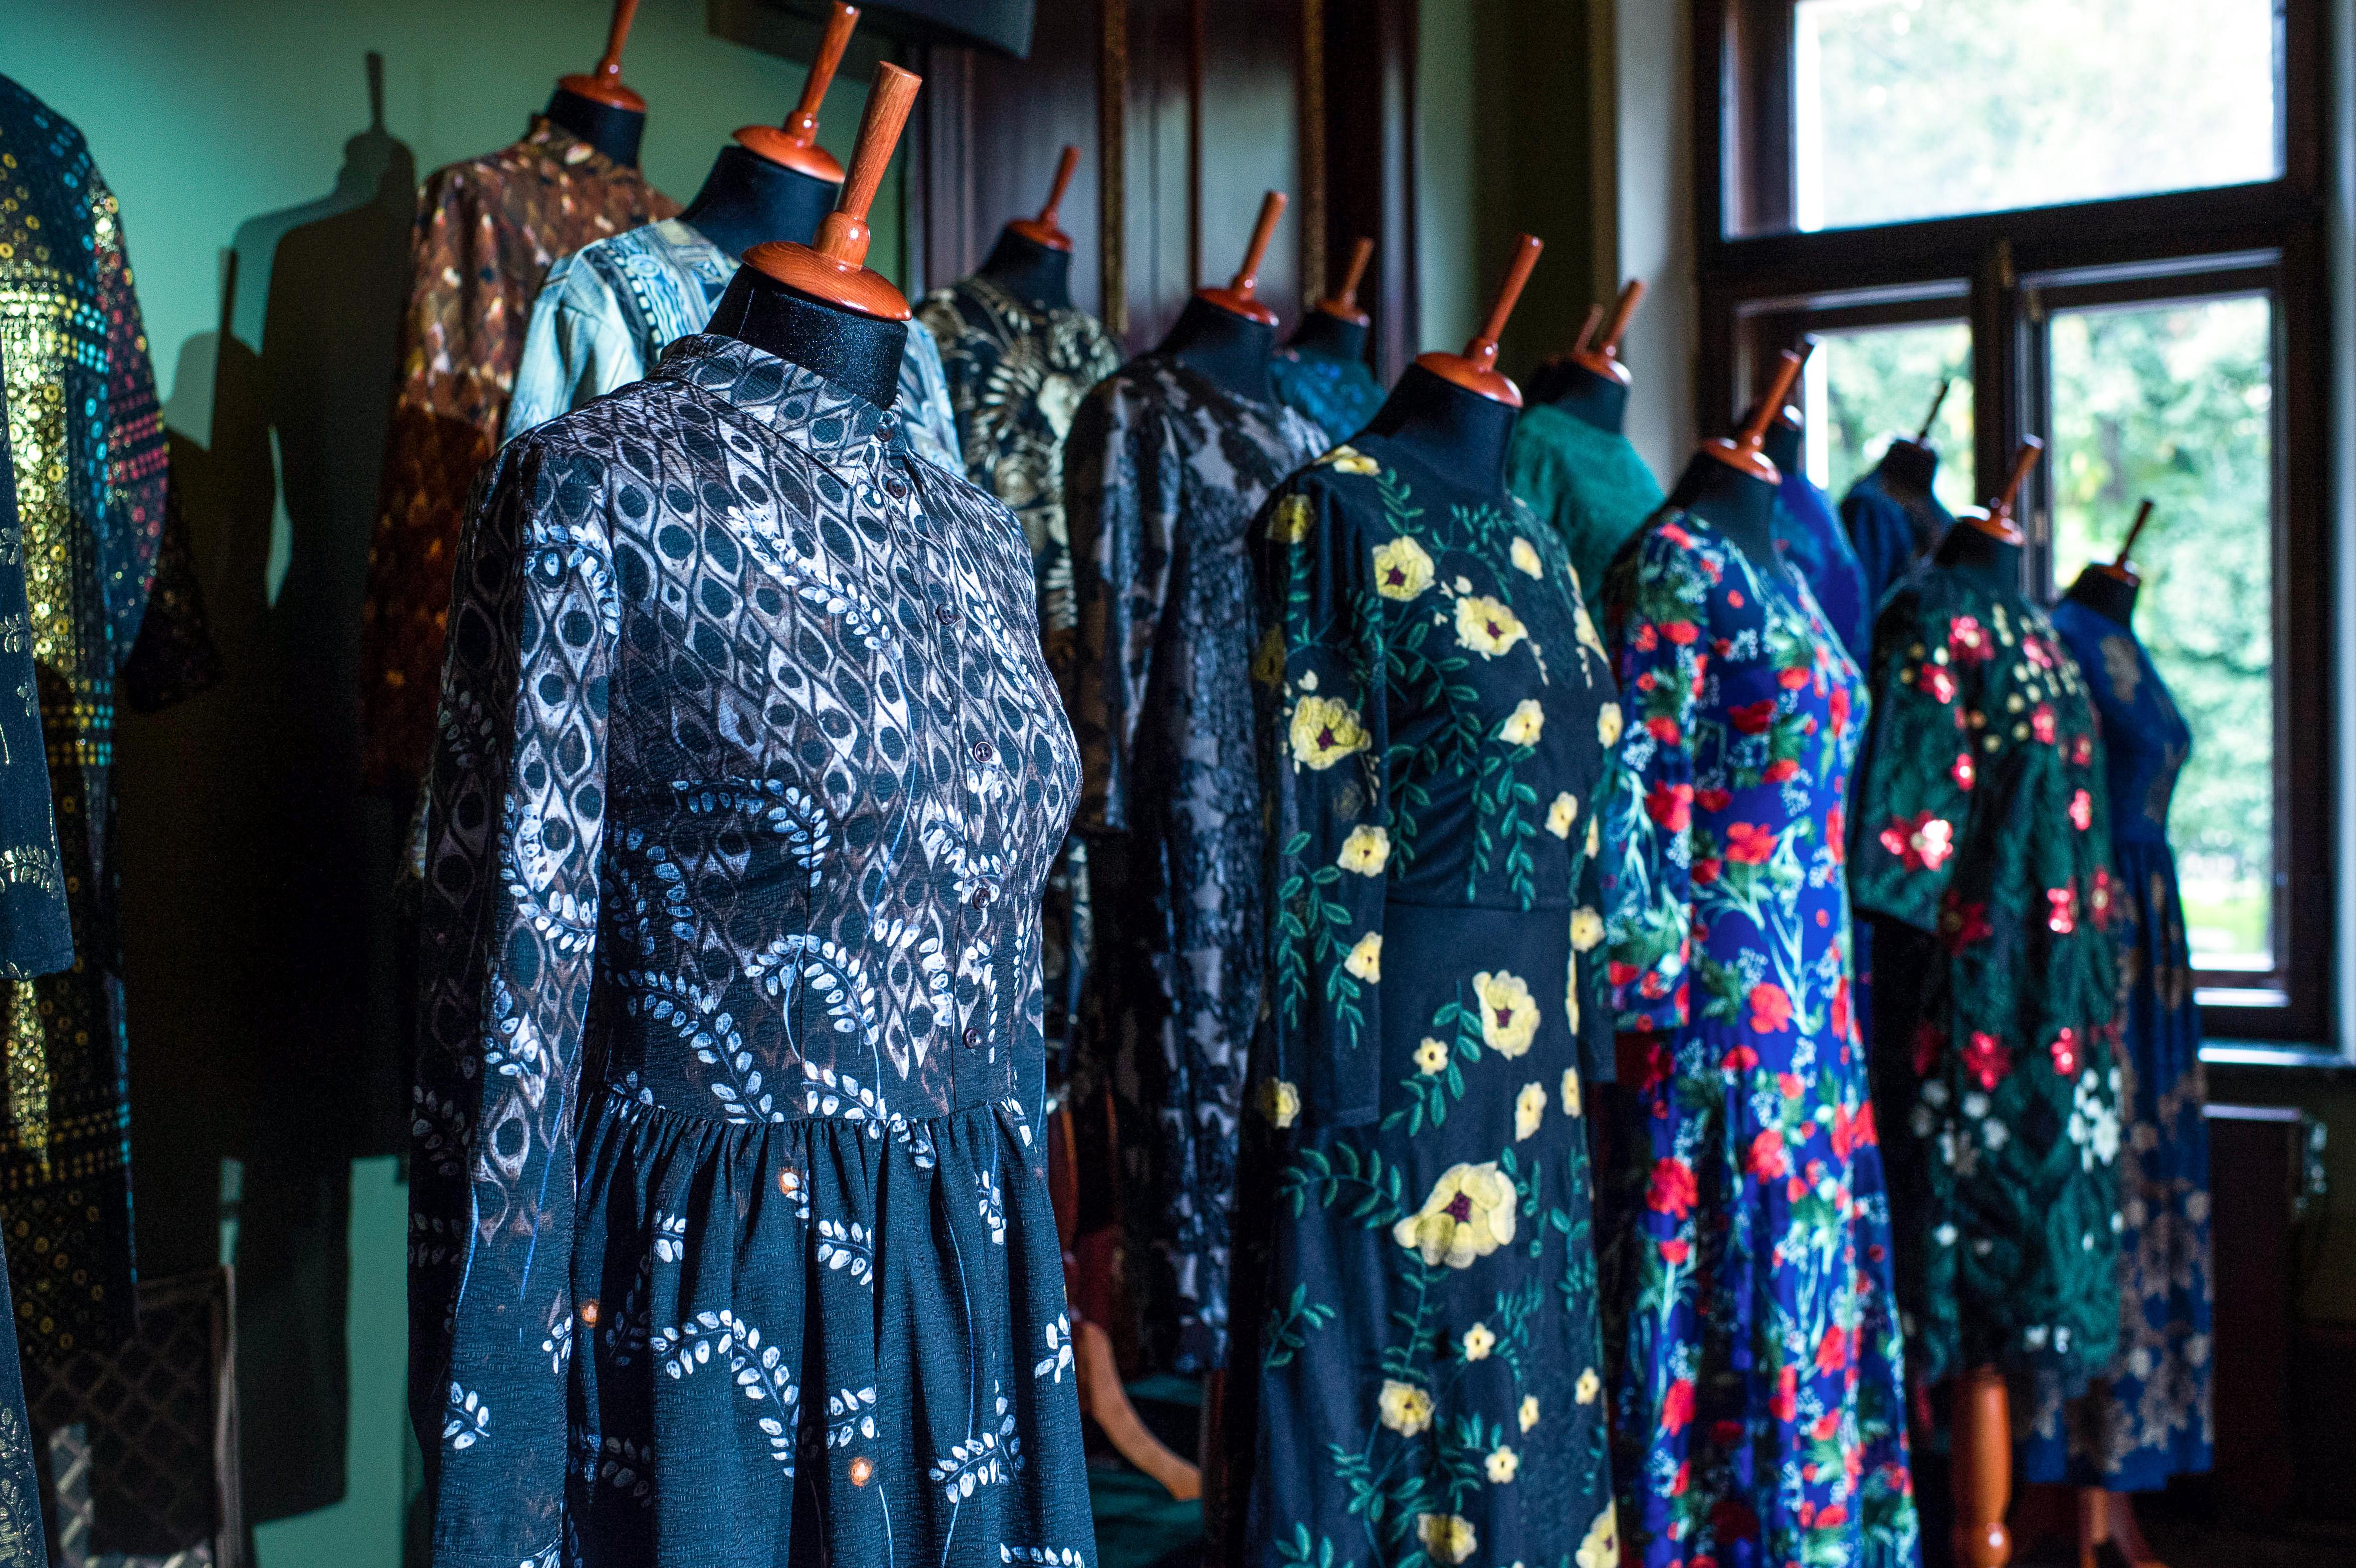 Презентация капсульных коллекций одежды и парфюма Faberlic by Alena Akhmadullina